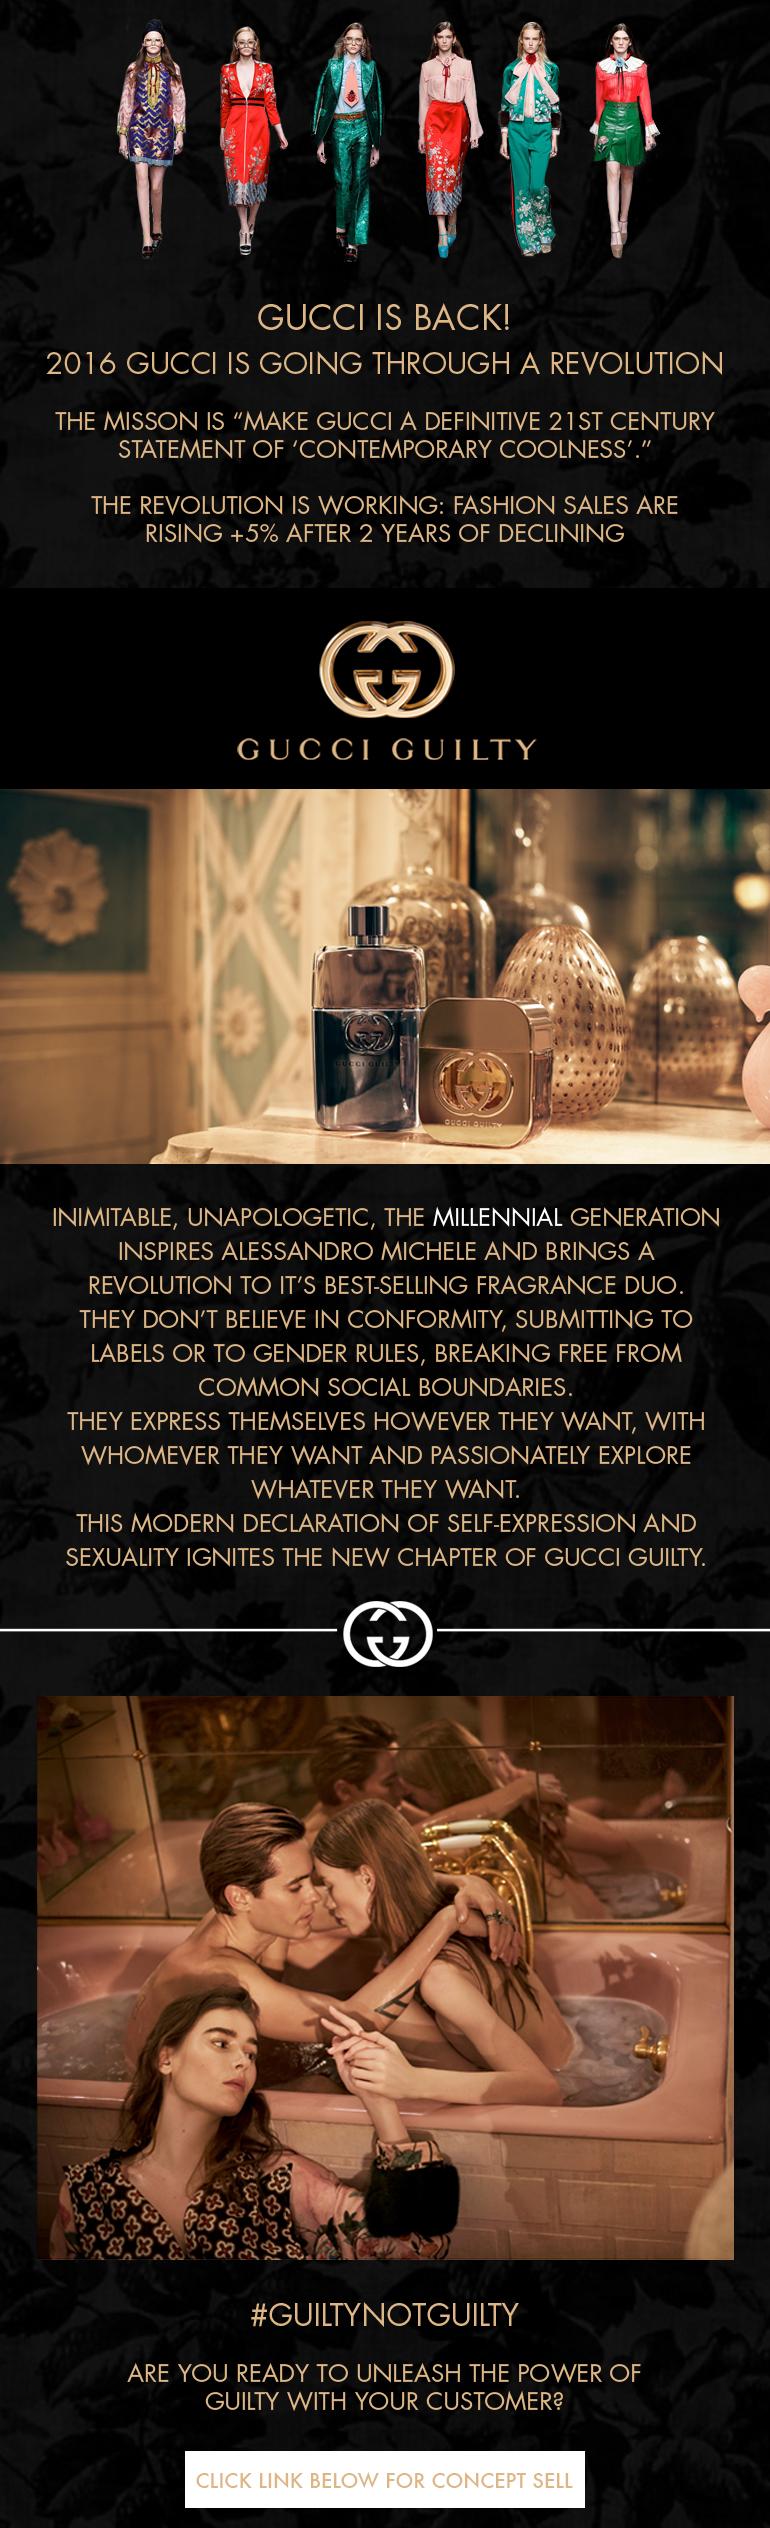 Design Digital Newsletter for Gucci Guilty